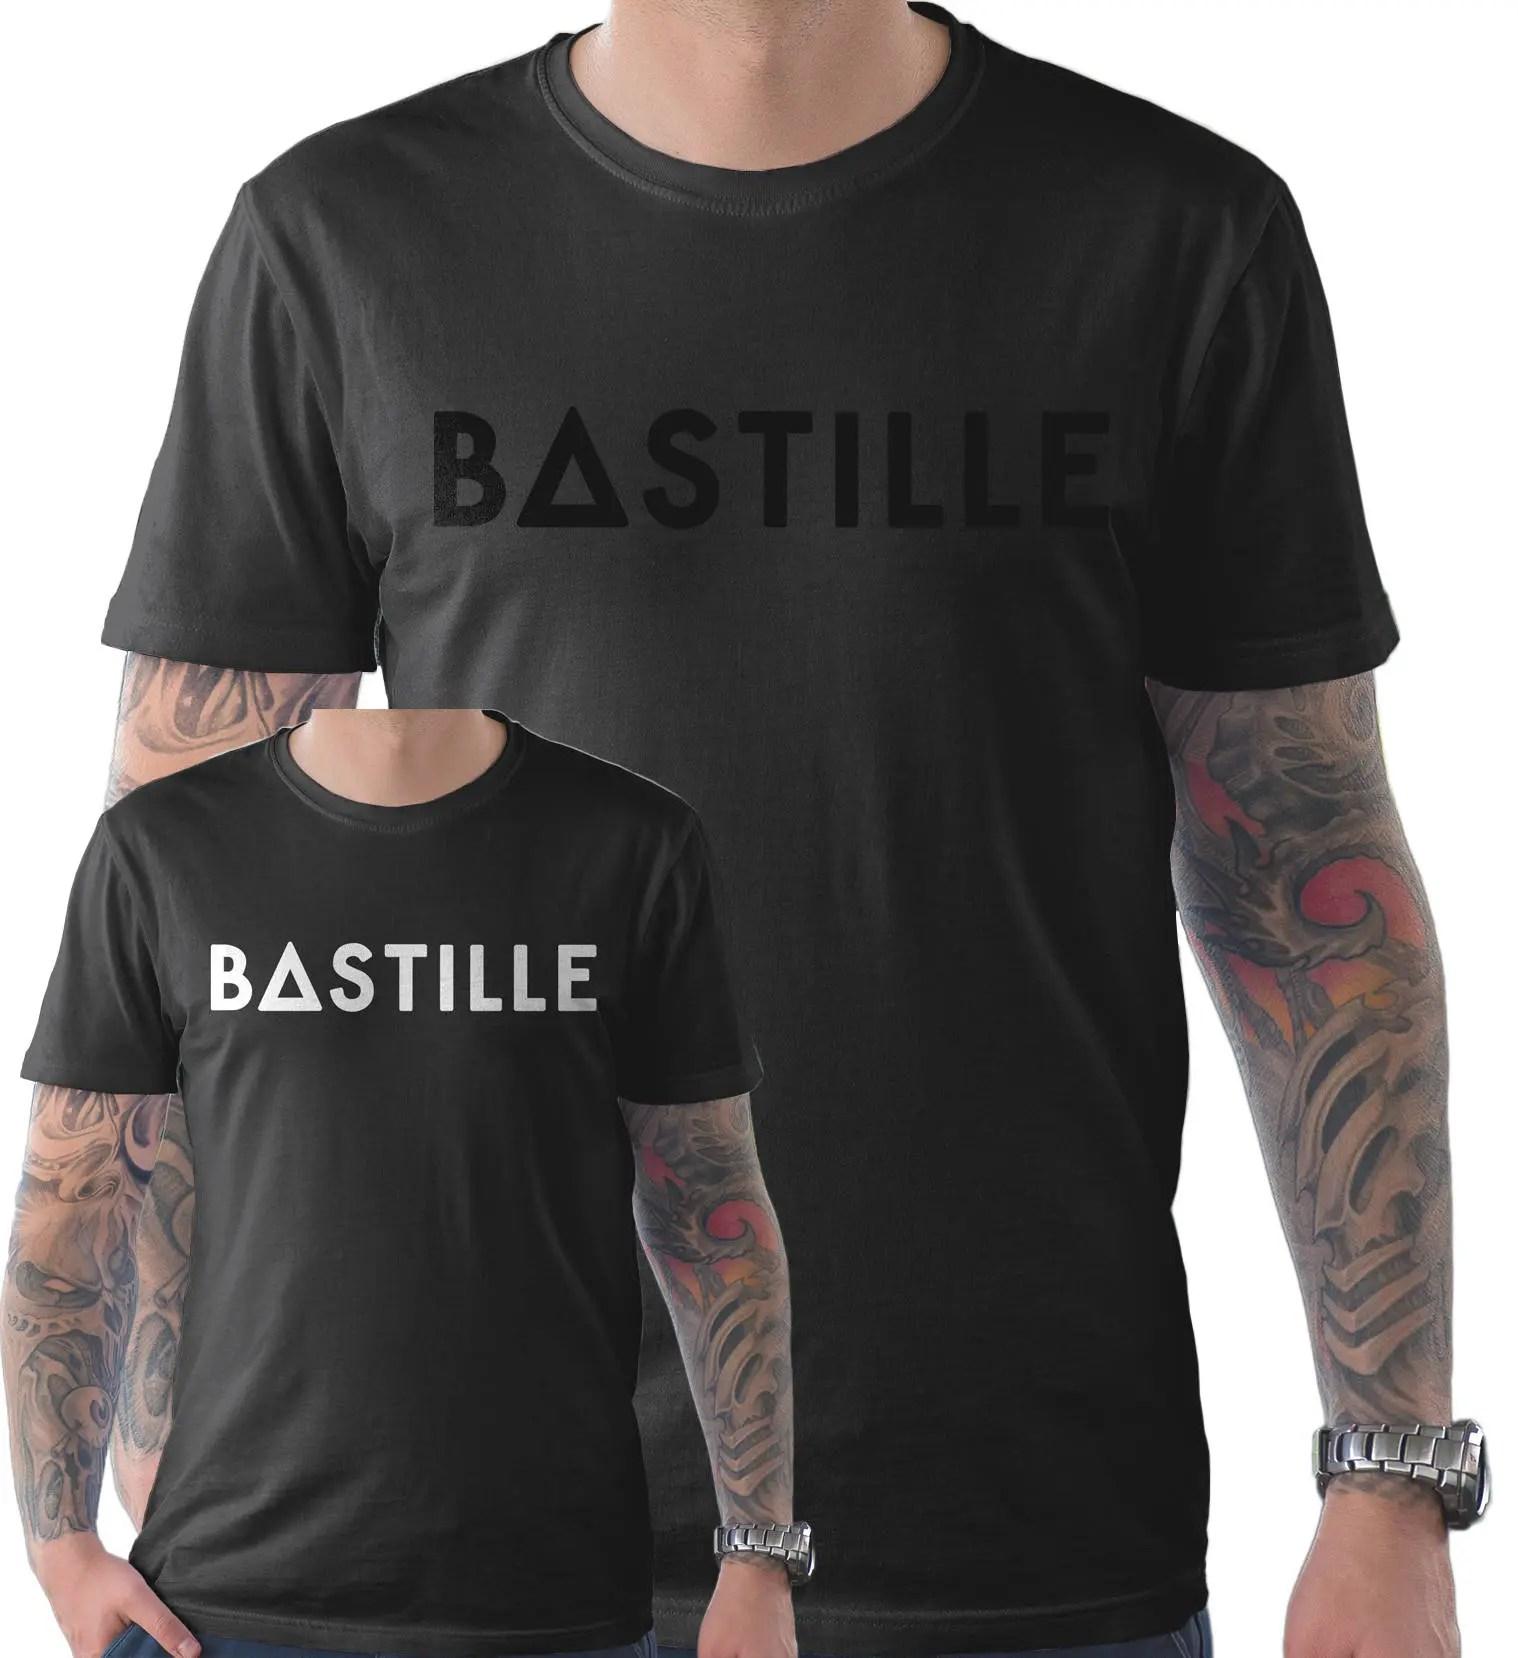 Bastille Indie Electro Band Music U. Dan Smith Flock Vinyl T